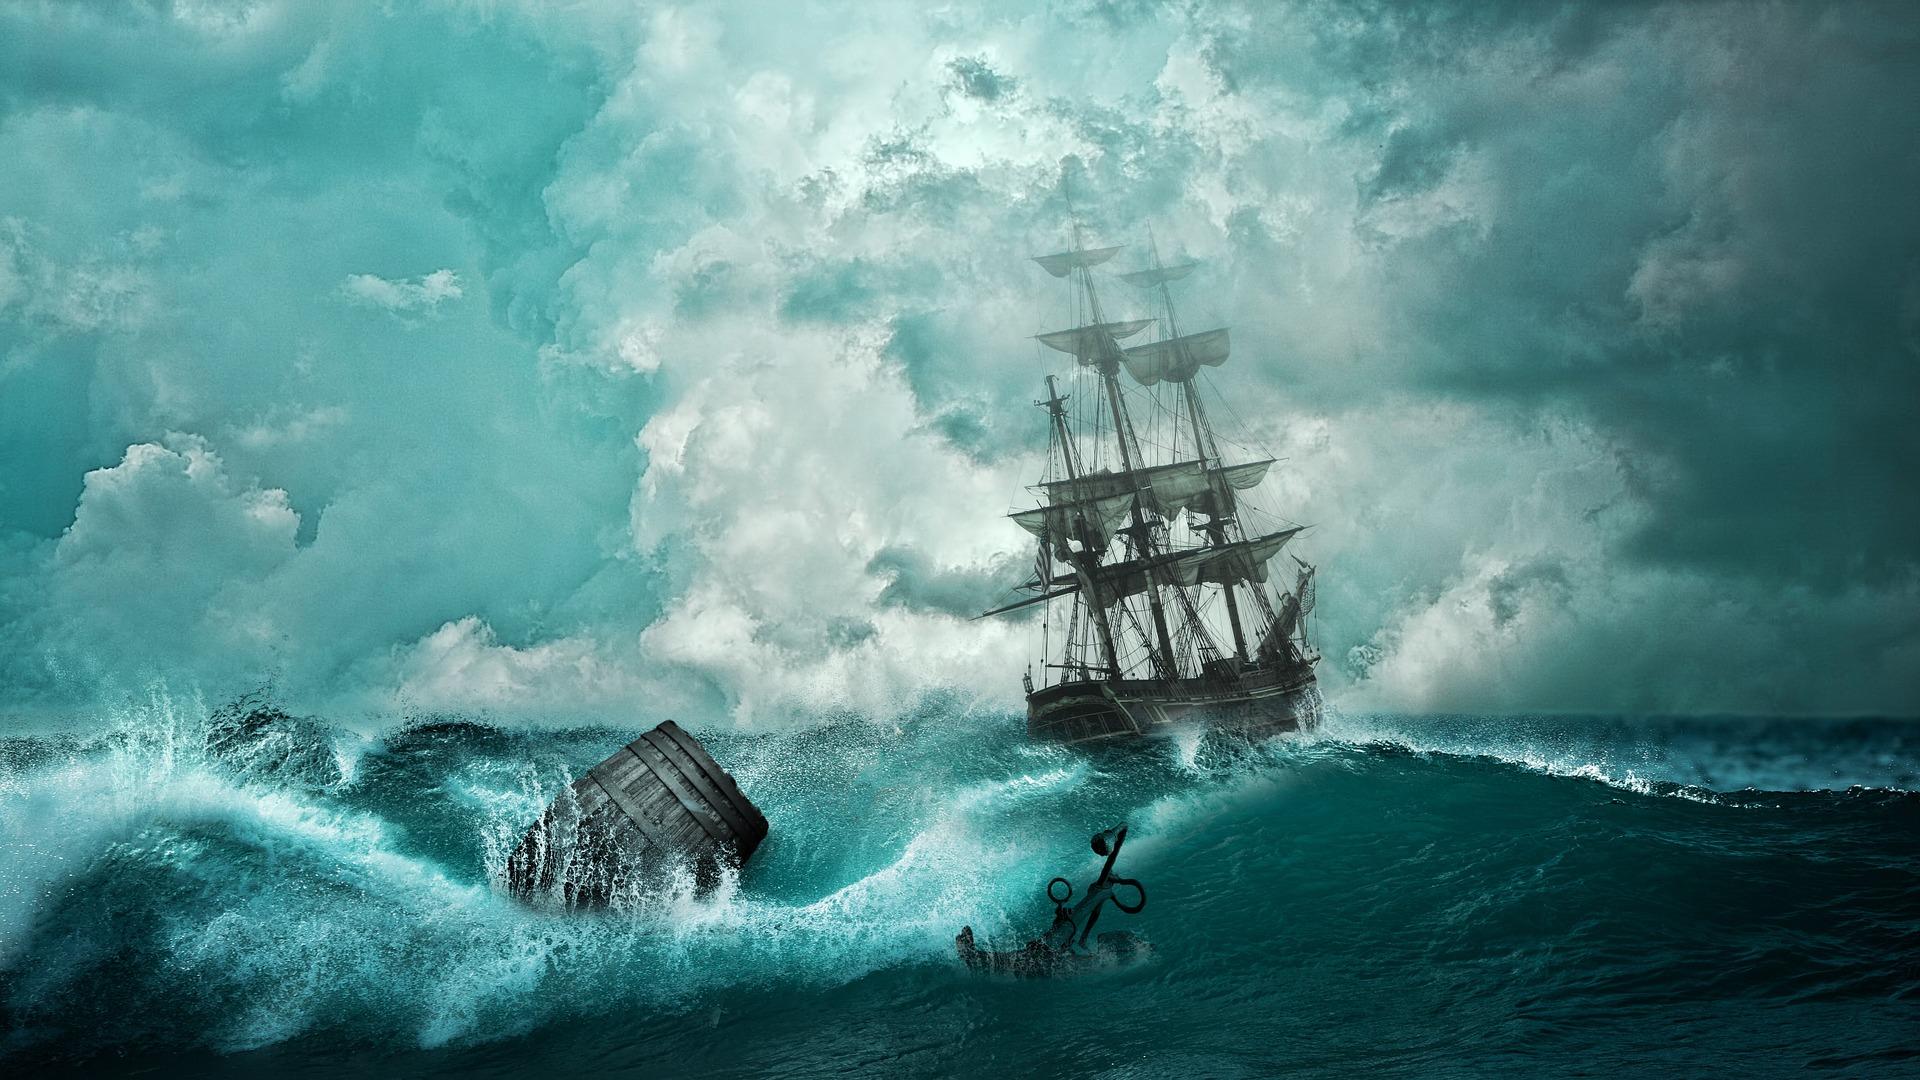 navire, Naufragio, bateau, Mer, Aventure, Tempest, ancre - Fonds d'écran HD - Professor-falken.com